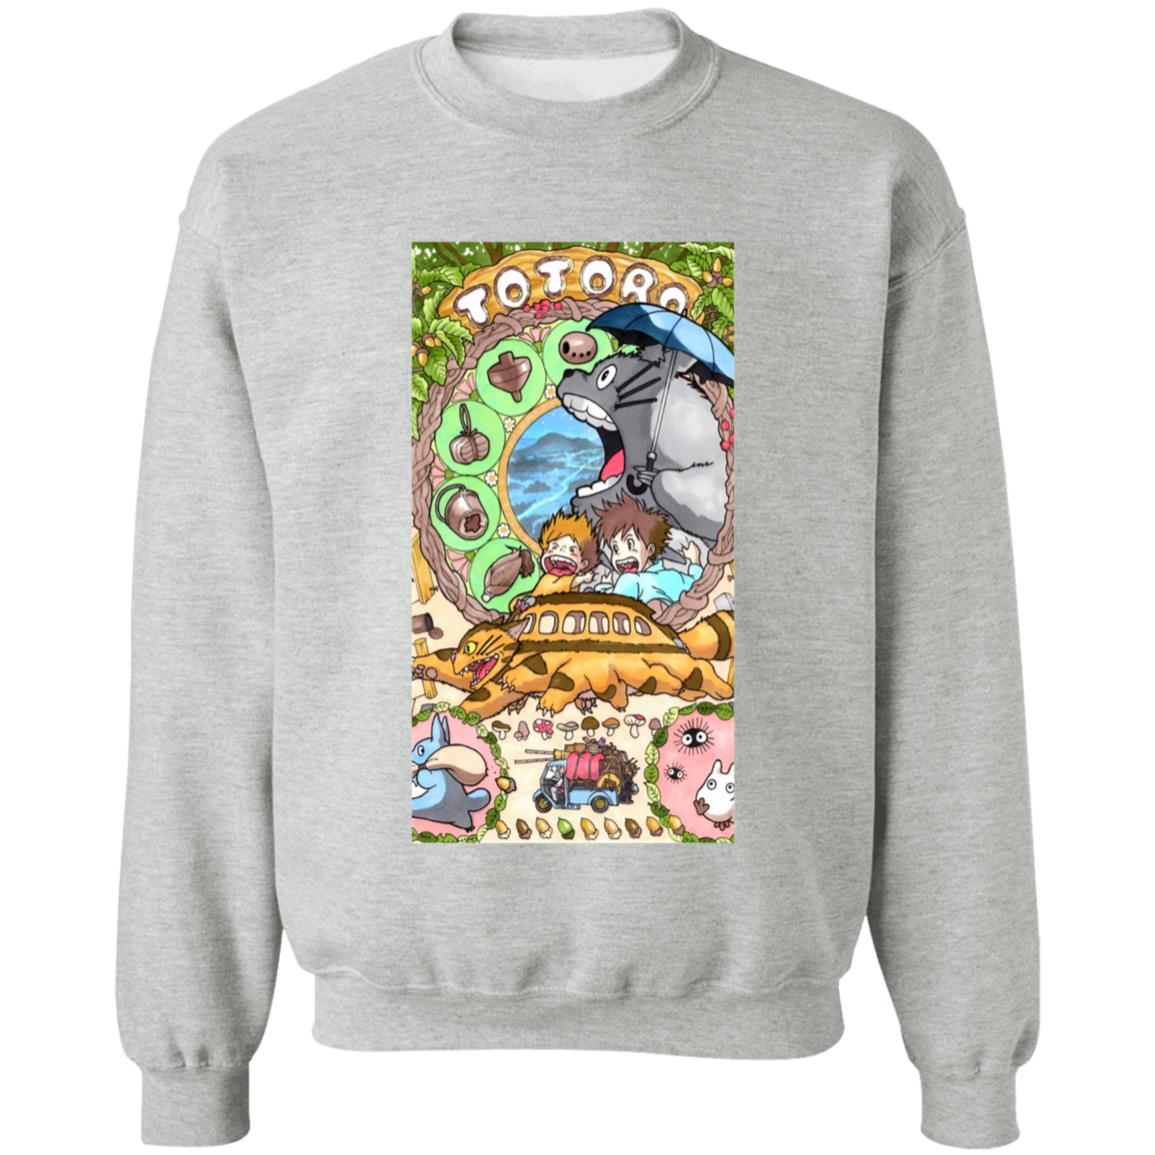 Totoro Portrait art Sweatshirt